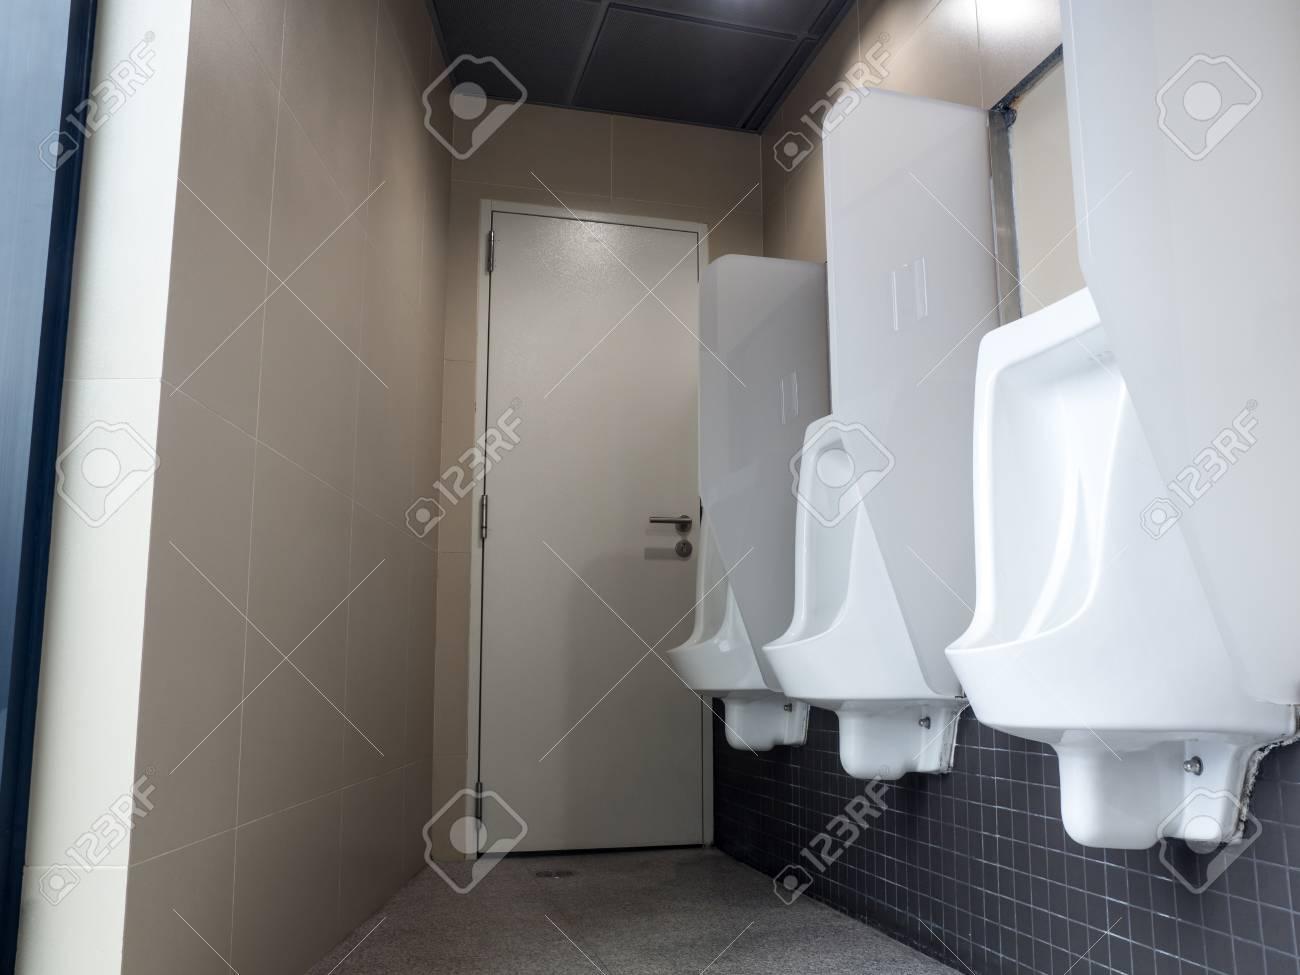 Stock Photo   Toilet Menu0027s Room.Close Up Row Of Outdoor Urinals Men Public  Toilet, Urinals In The Menu0027s Bathroom Urinals Design